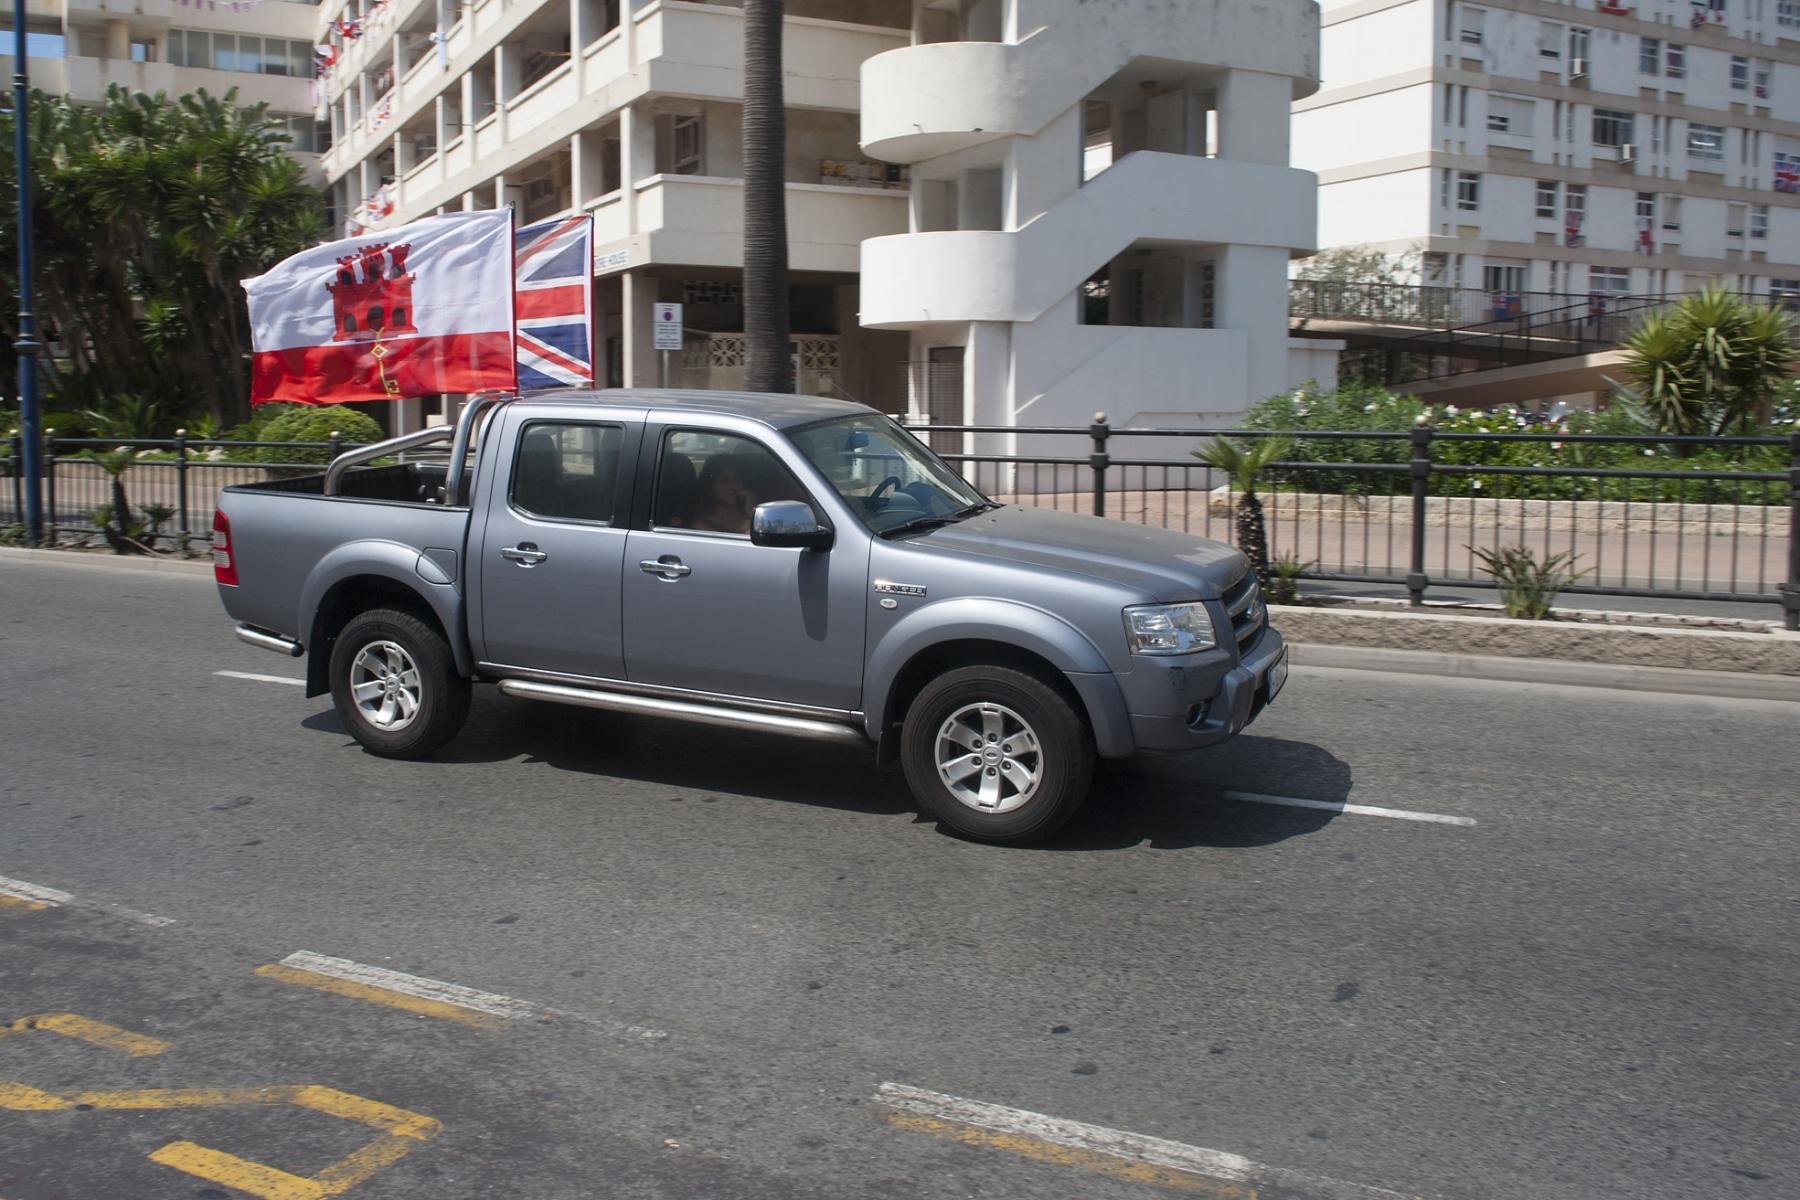 gibraltar-national-day_036_9719727540_o